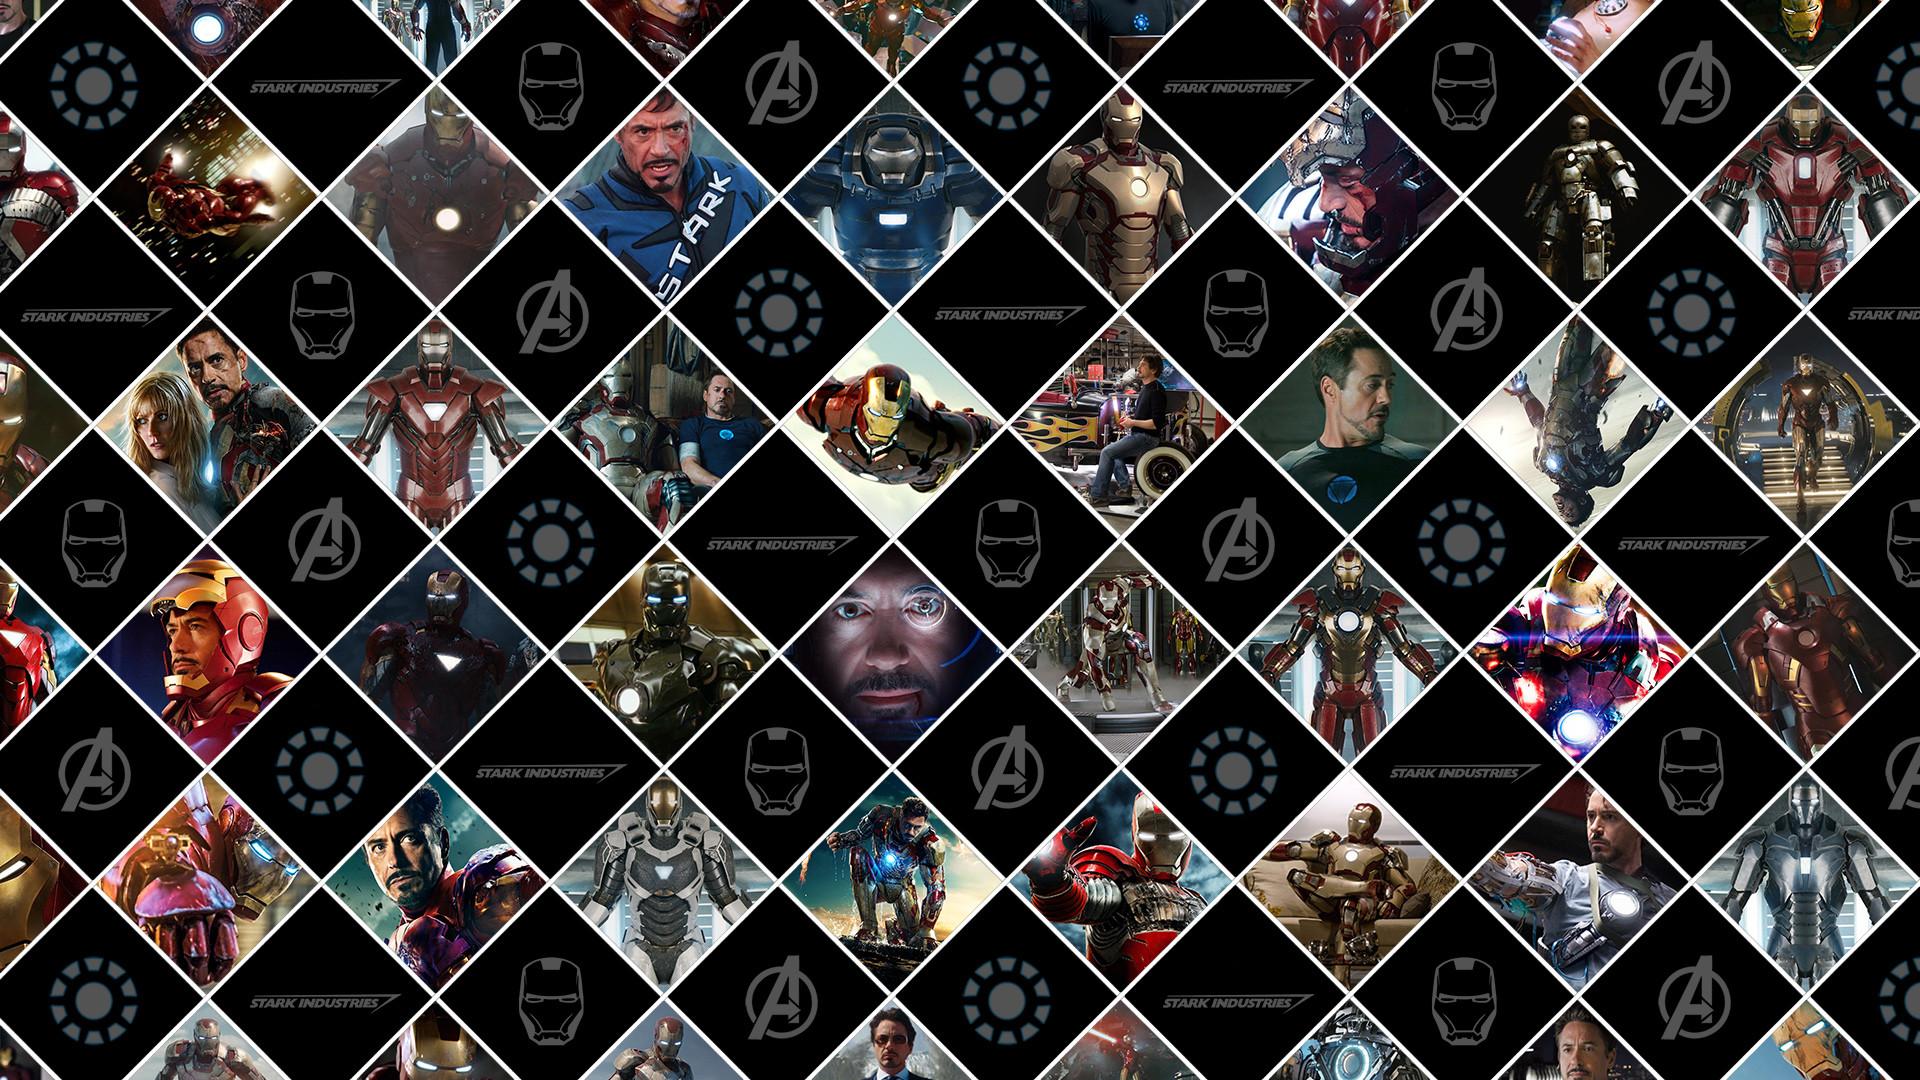 Jarvis Iron Man Wallpaper Hd: Jarvis Iron Man Wallpaper HD (74+ Images